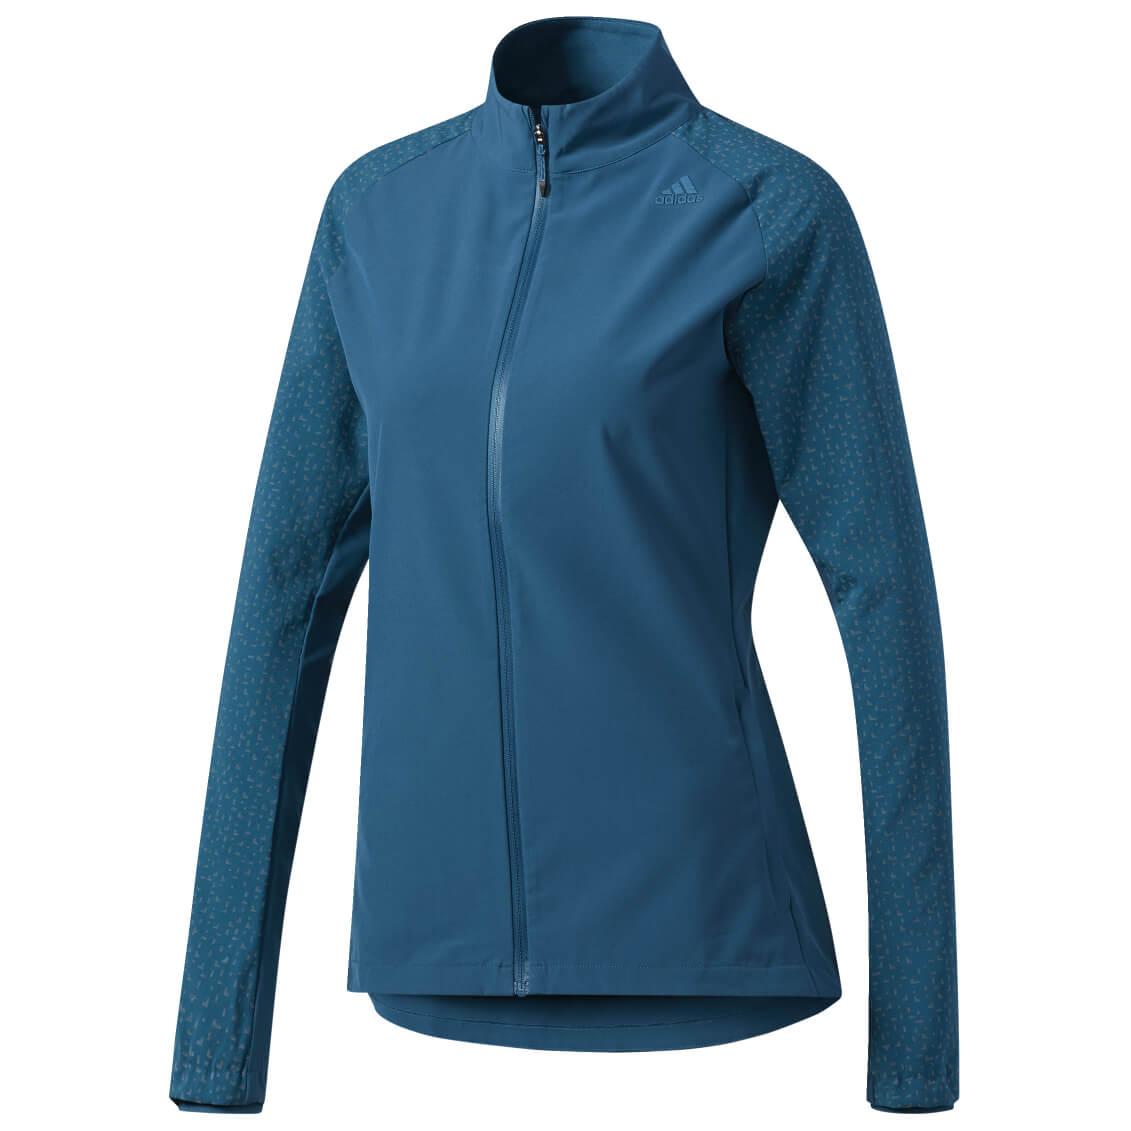 Adidas Supernova Storm Jacket Running jacket Women's | Buy